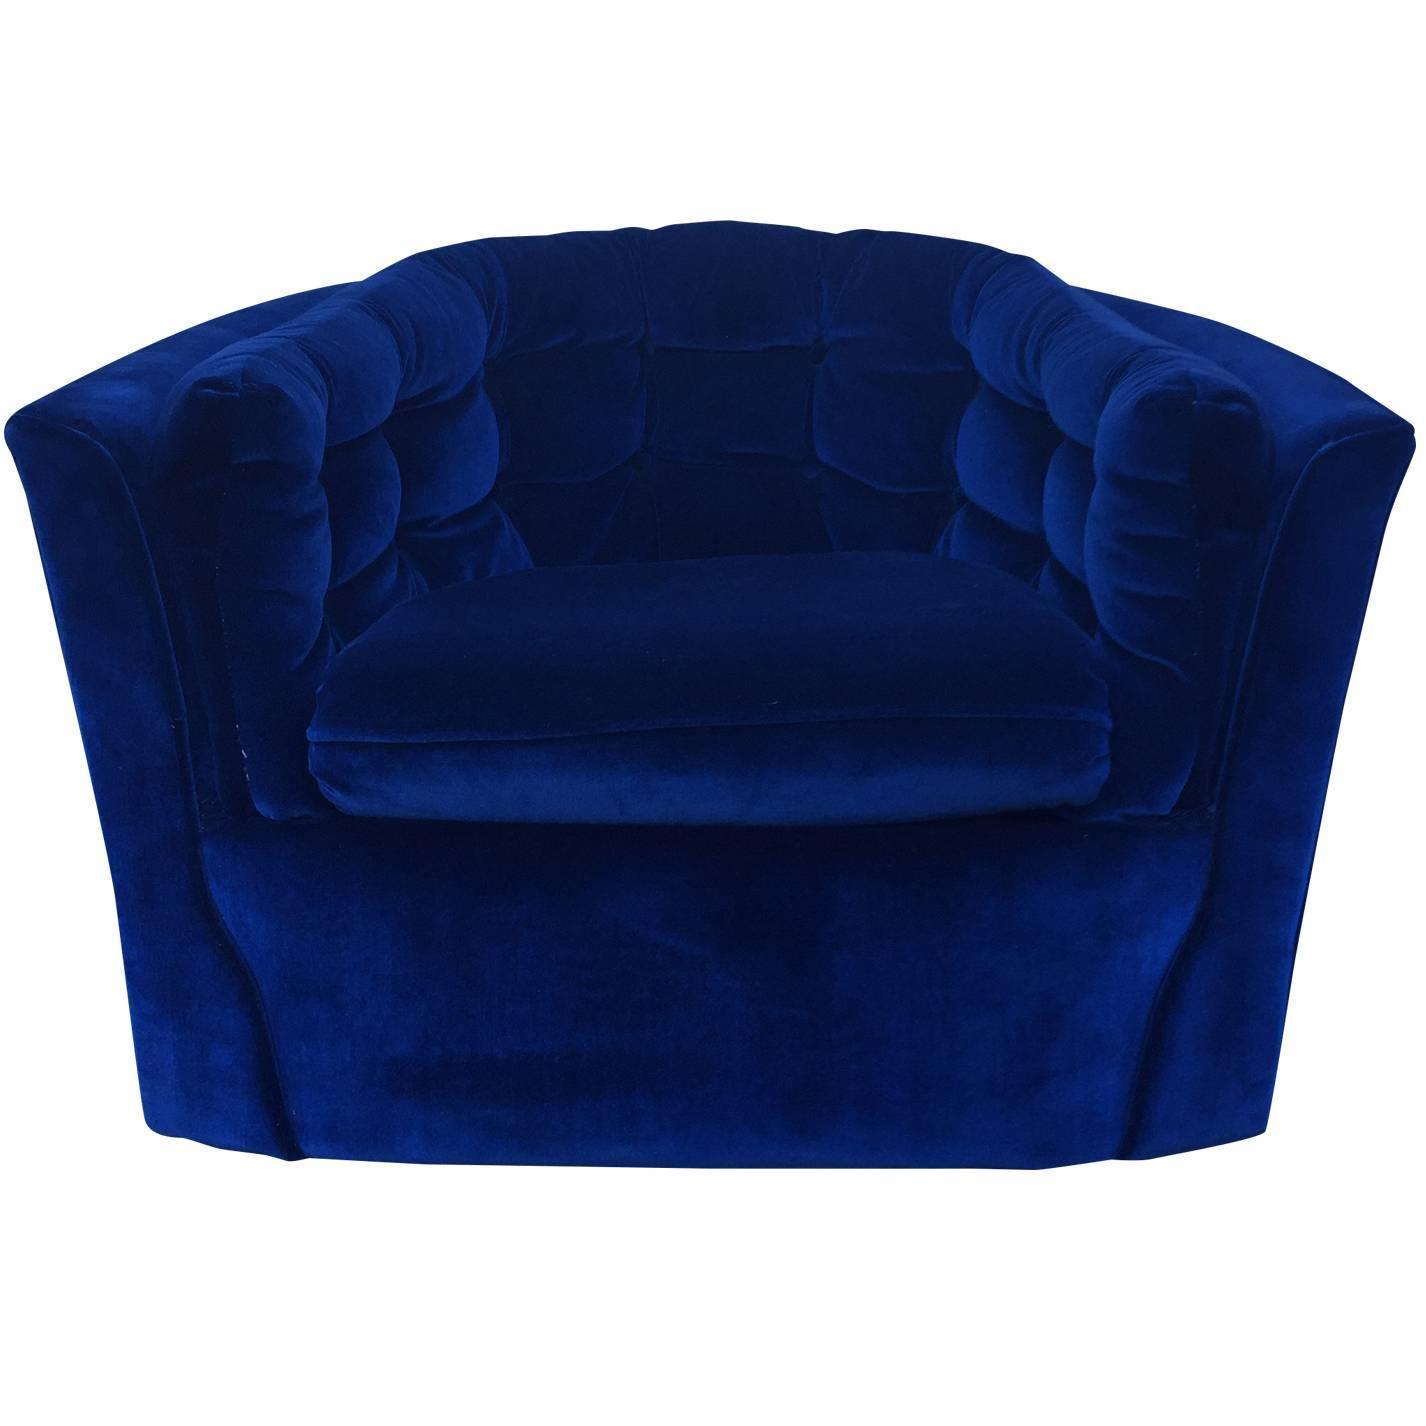 Oversized round swivel lounge chair mid century modern at 1stdibs - Royal Blue Velvet Mid Century Modern Swivel Chair